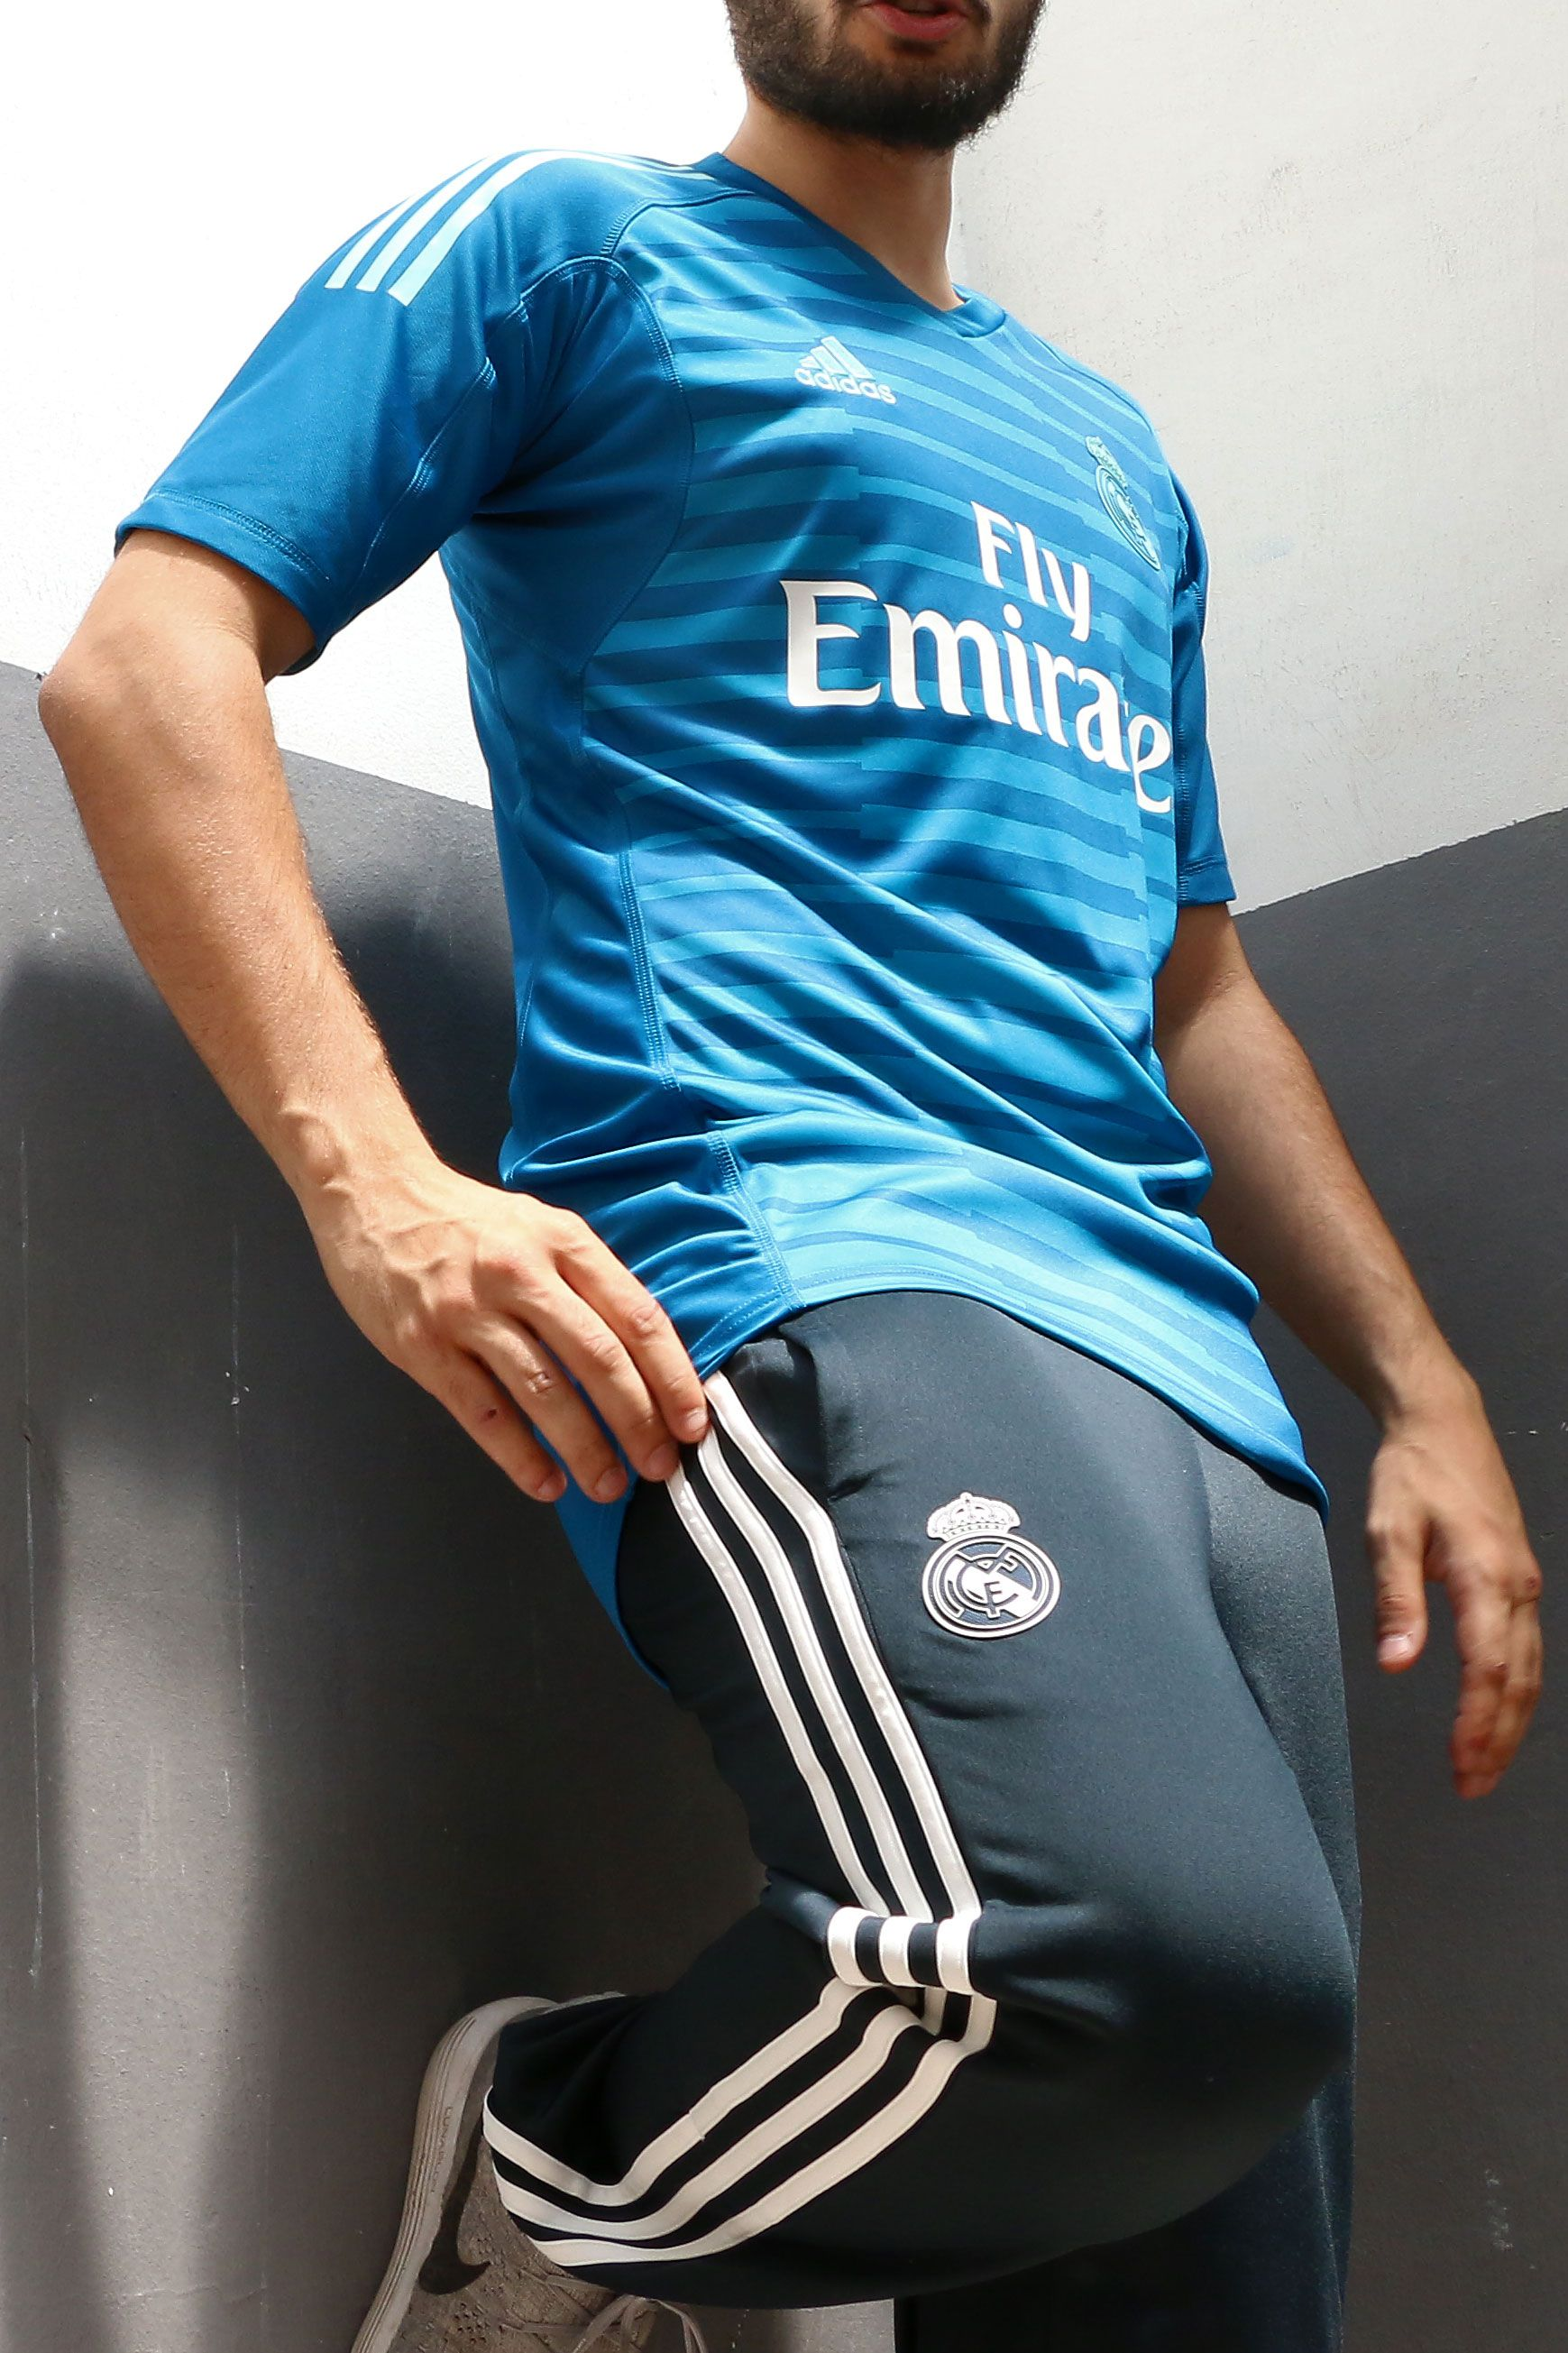 Camiseta de portero Real Madrid 2018 - 2019 - azul celeste  cf6d3ee7a1e3d